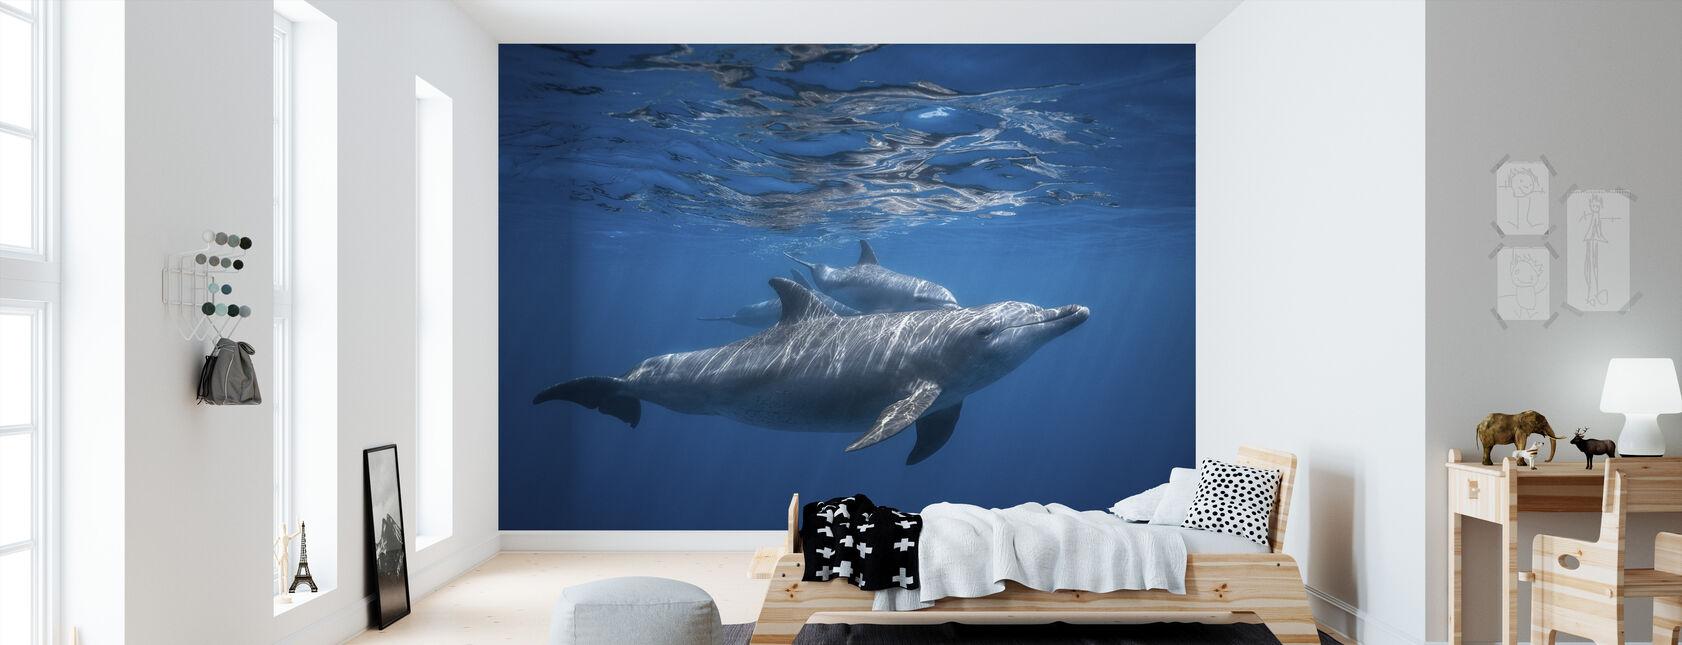 Pod of Dolphin - Wallpaper - Kids Room